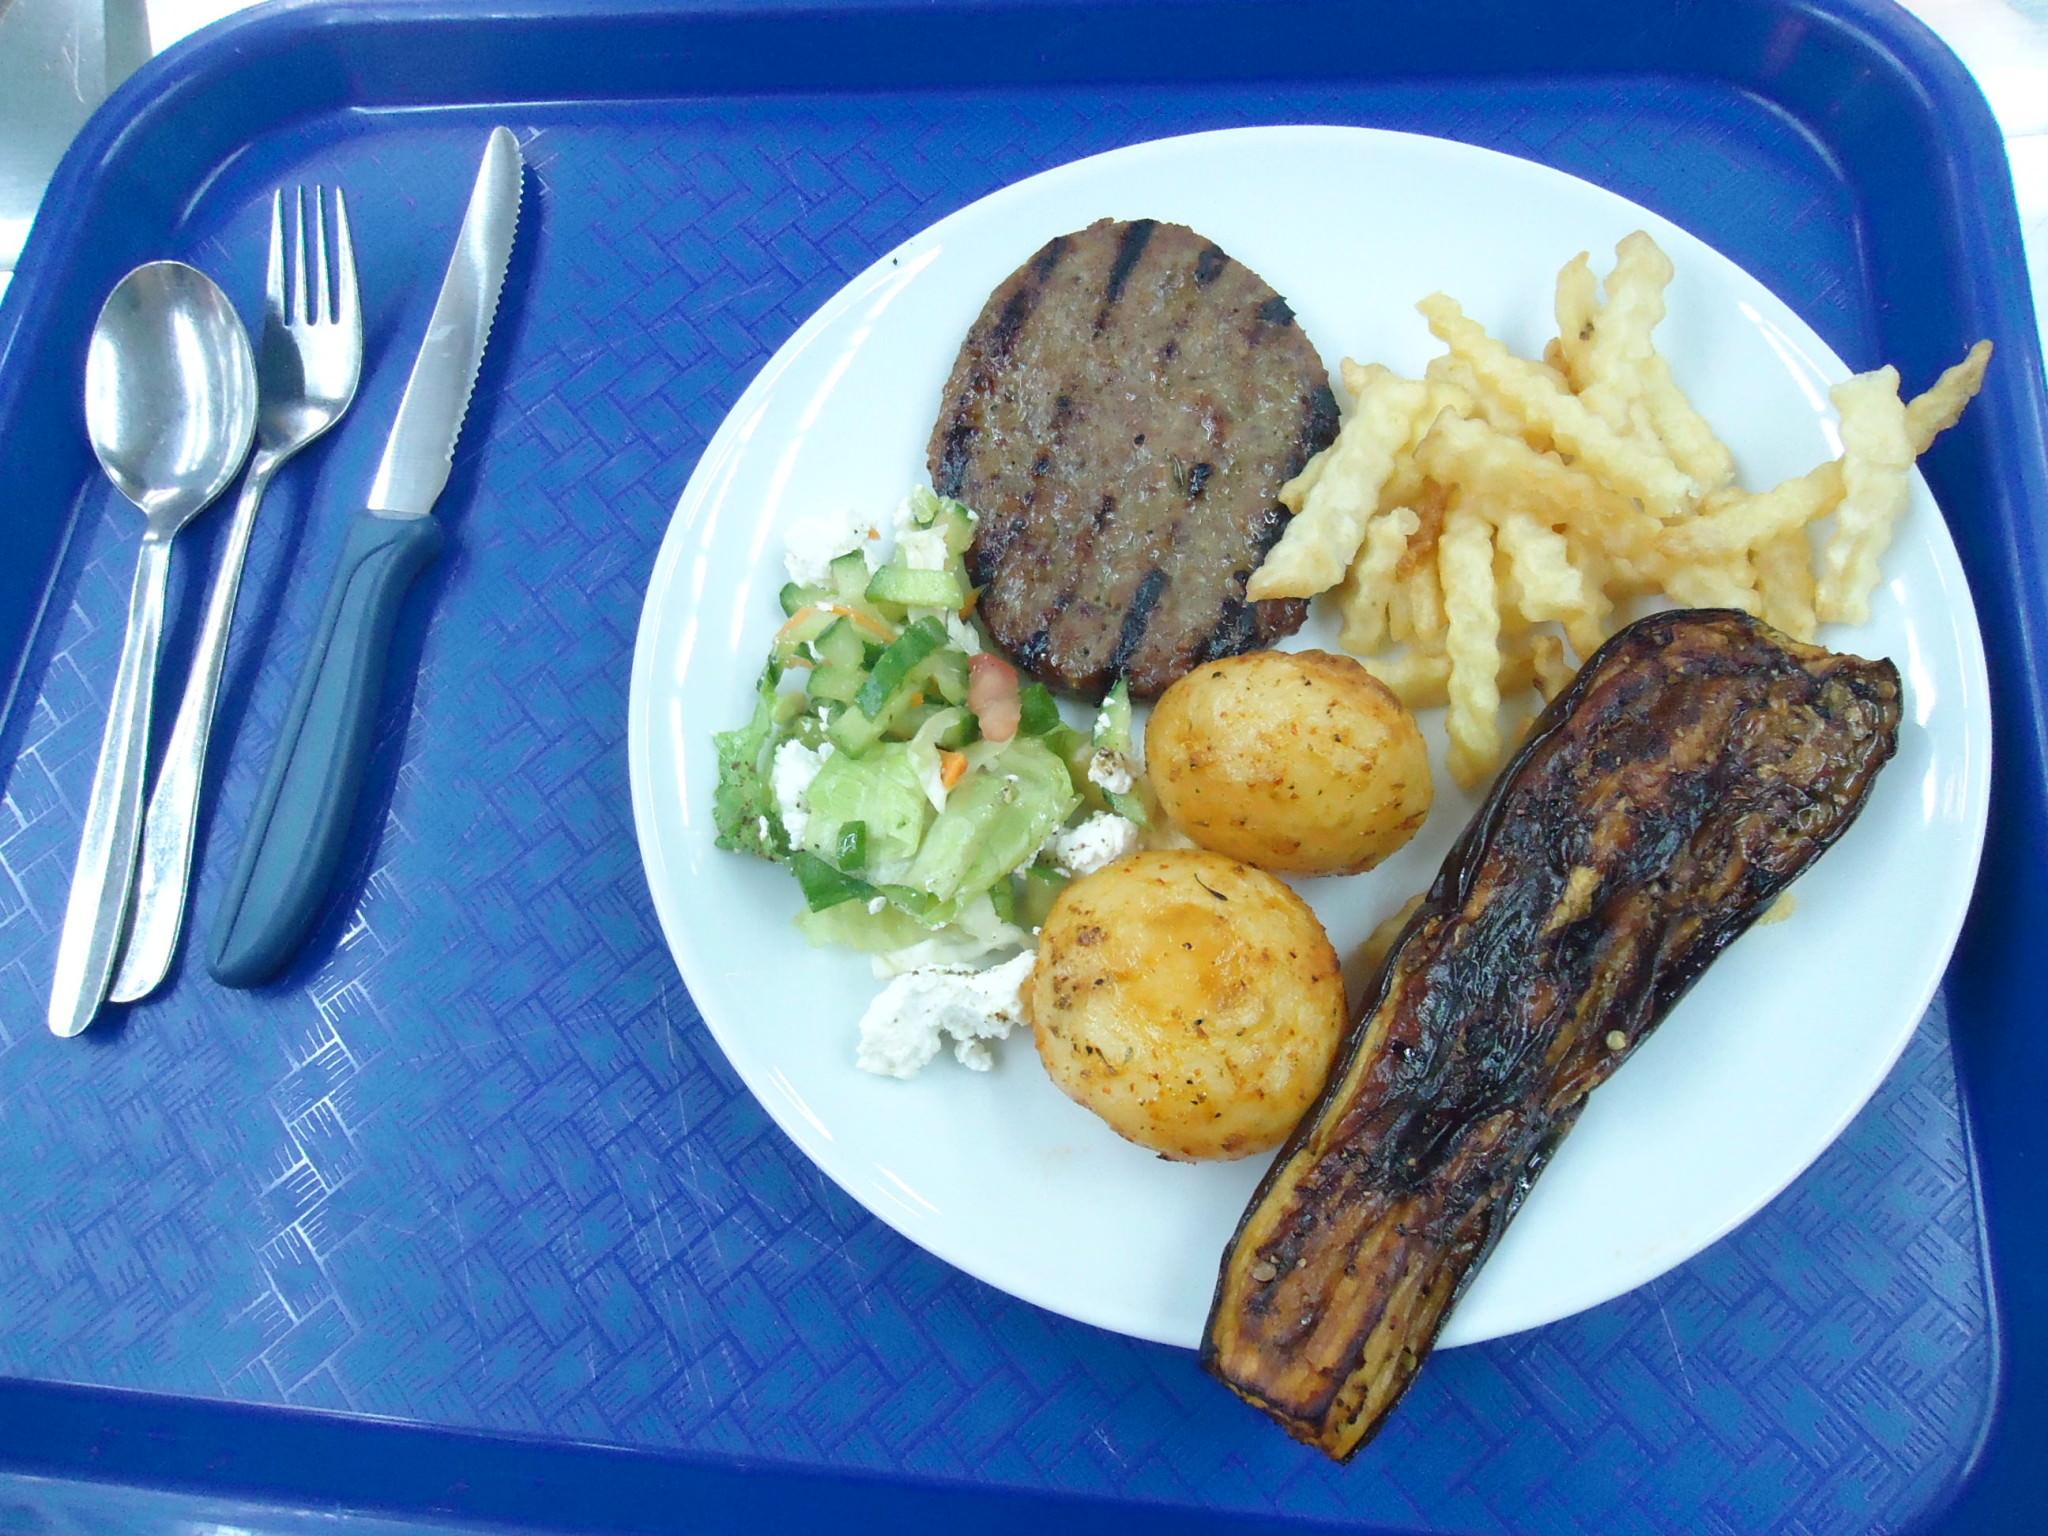 lunch in mizra kibbutz